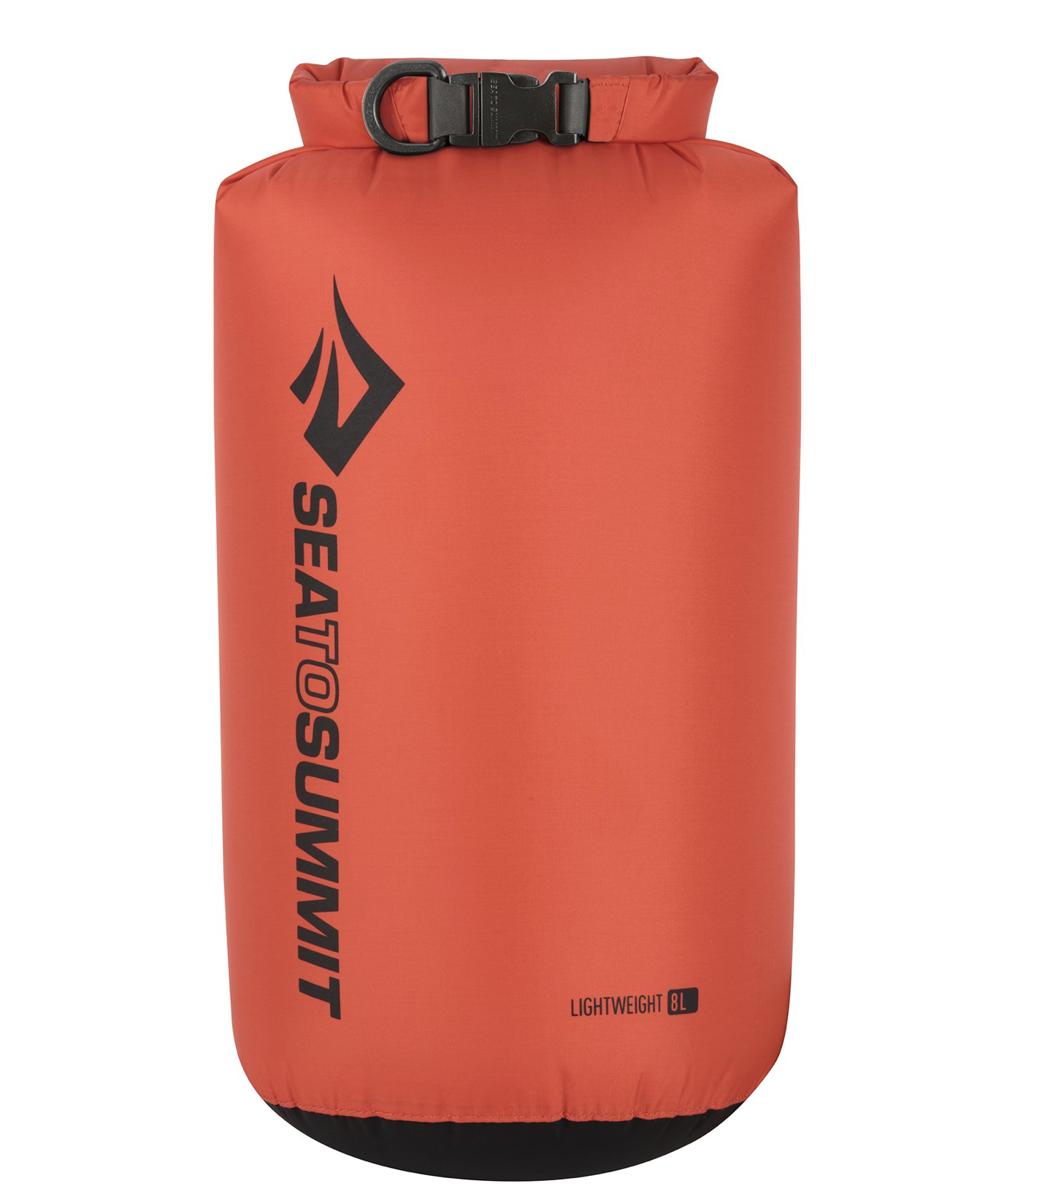 Bilde av Sea To Summit  Lightweight Dry Sack 8L Rød